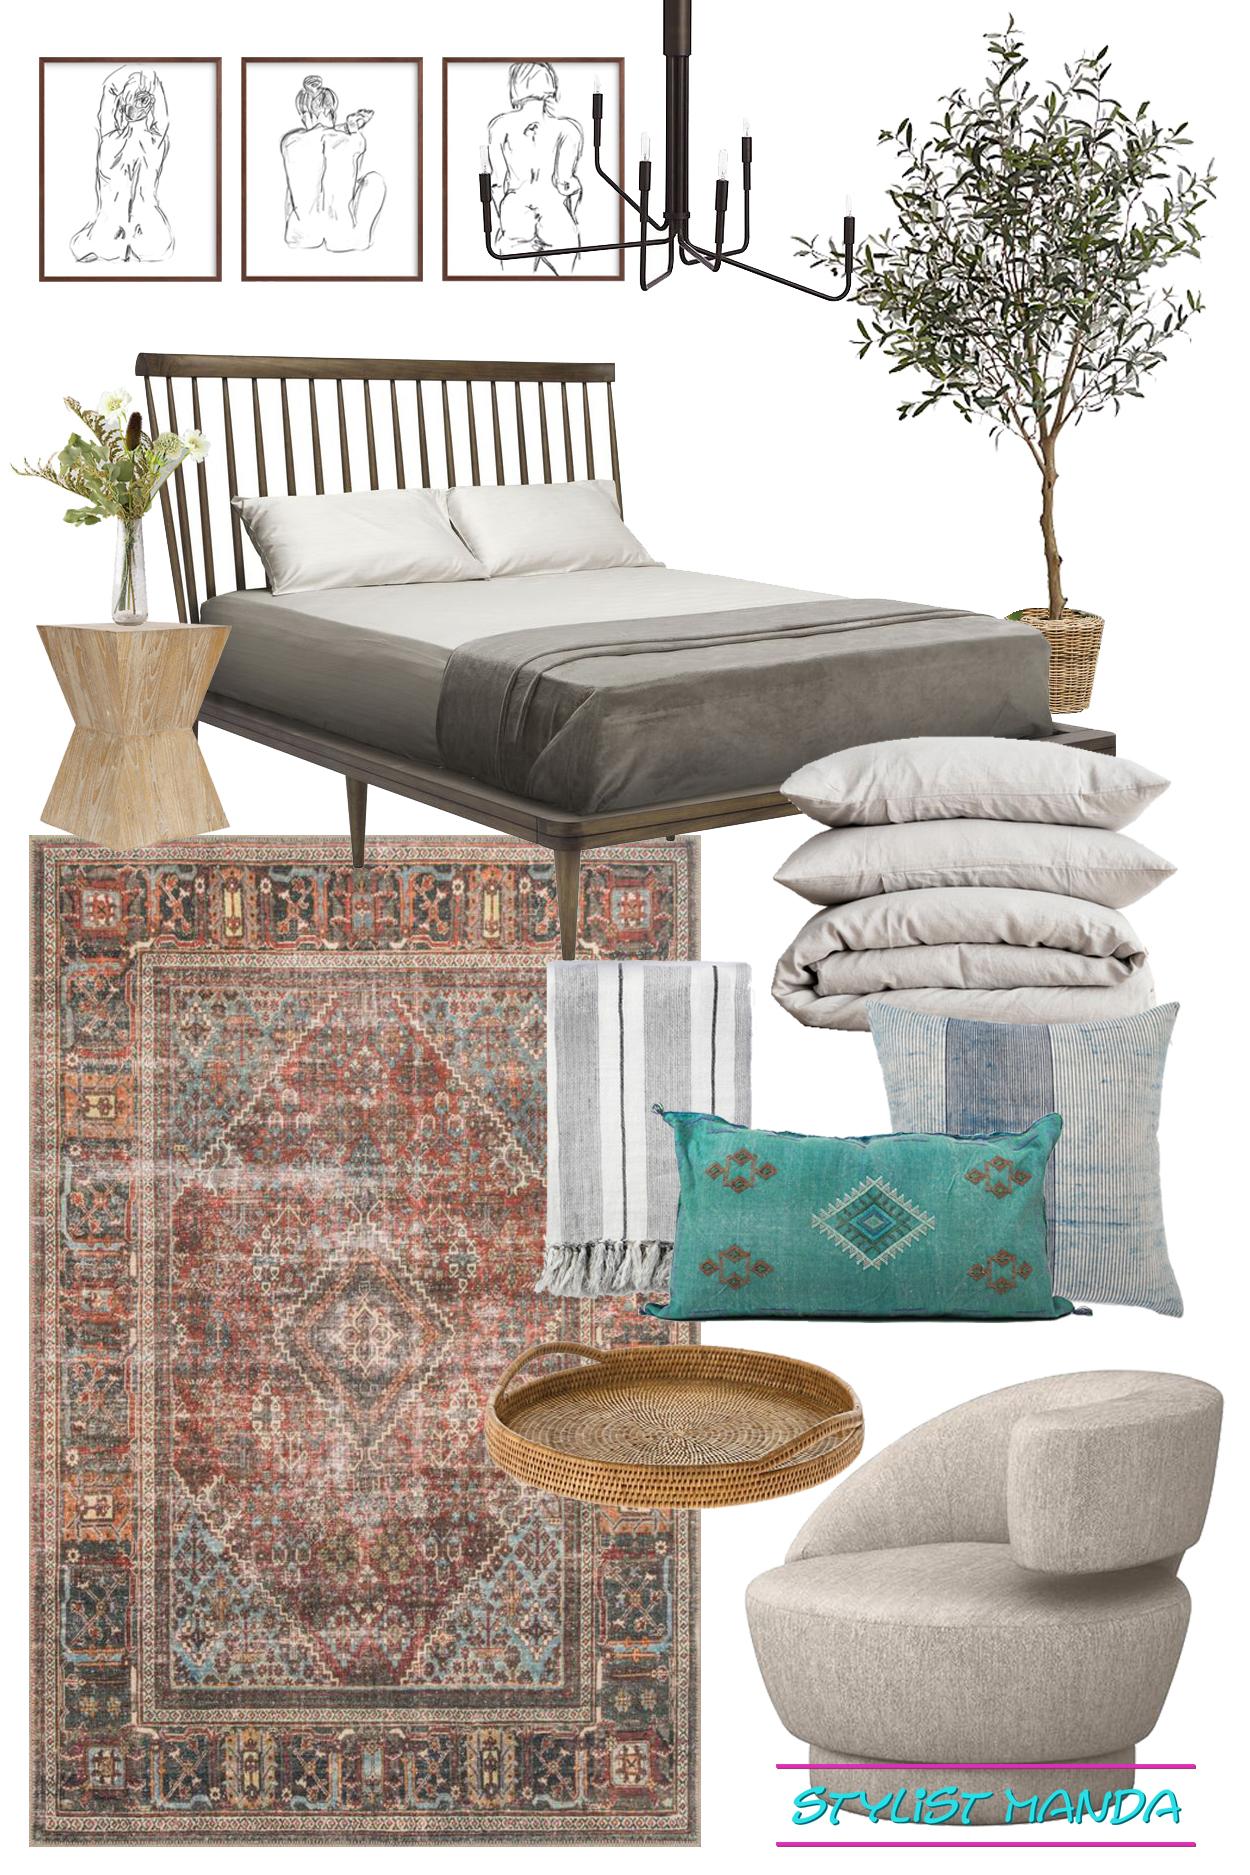 Bedroom Design California Casual vibe a shoppable design